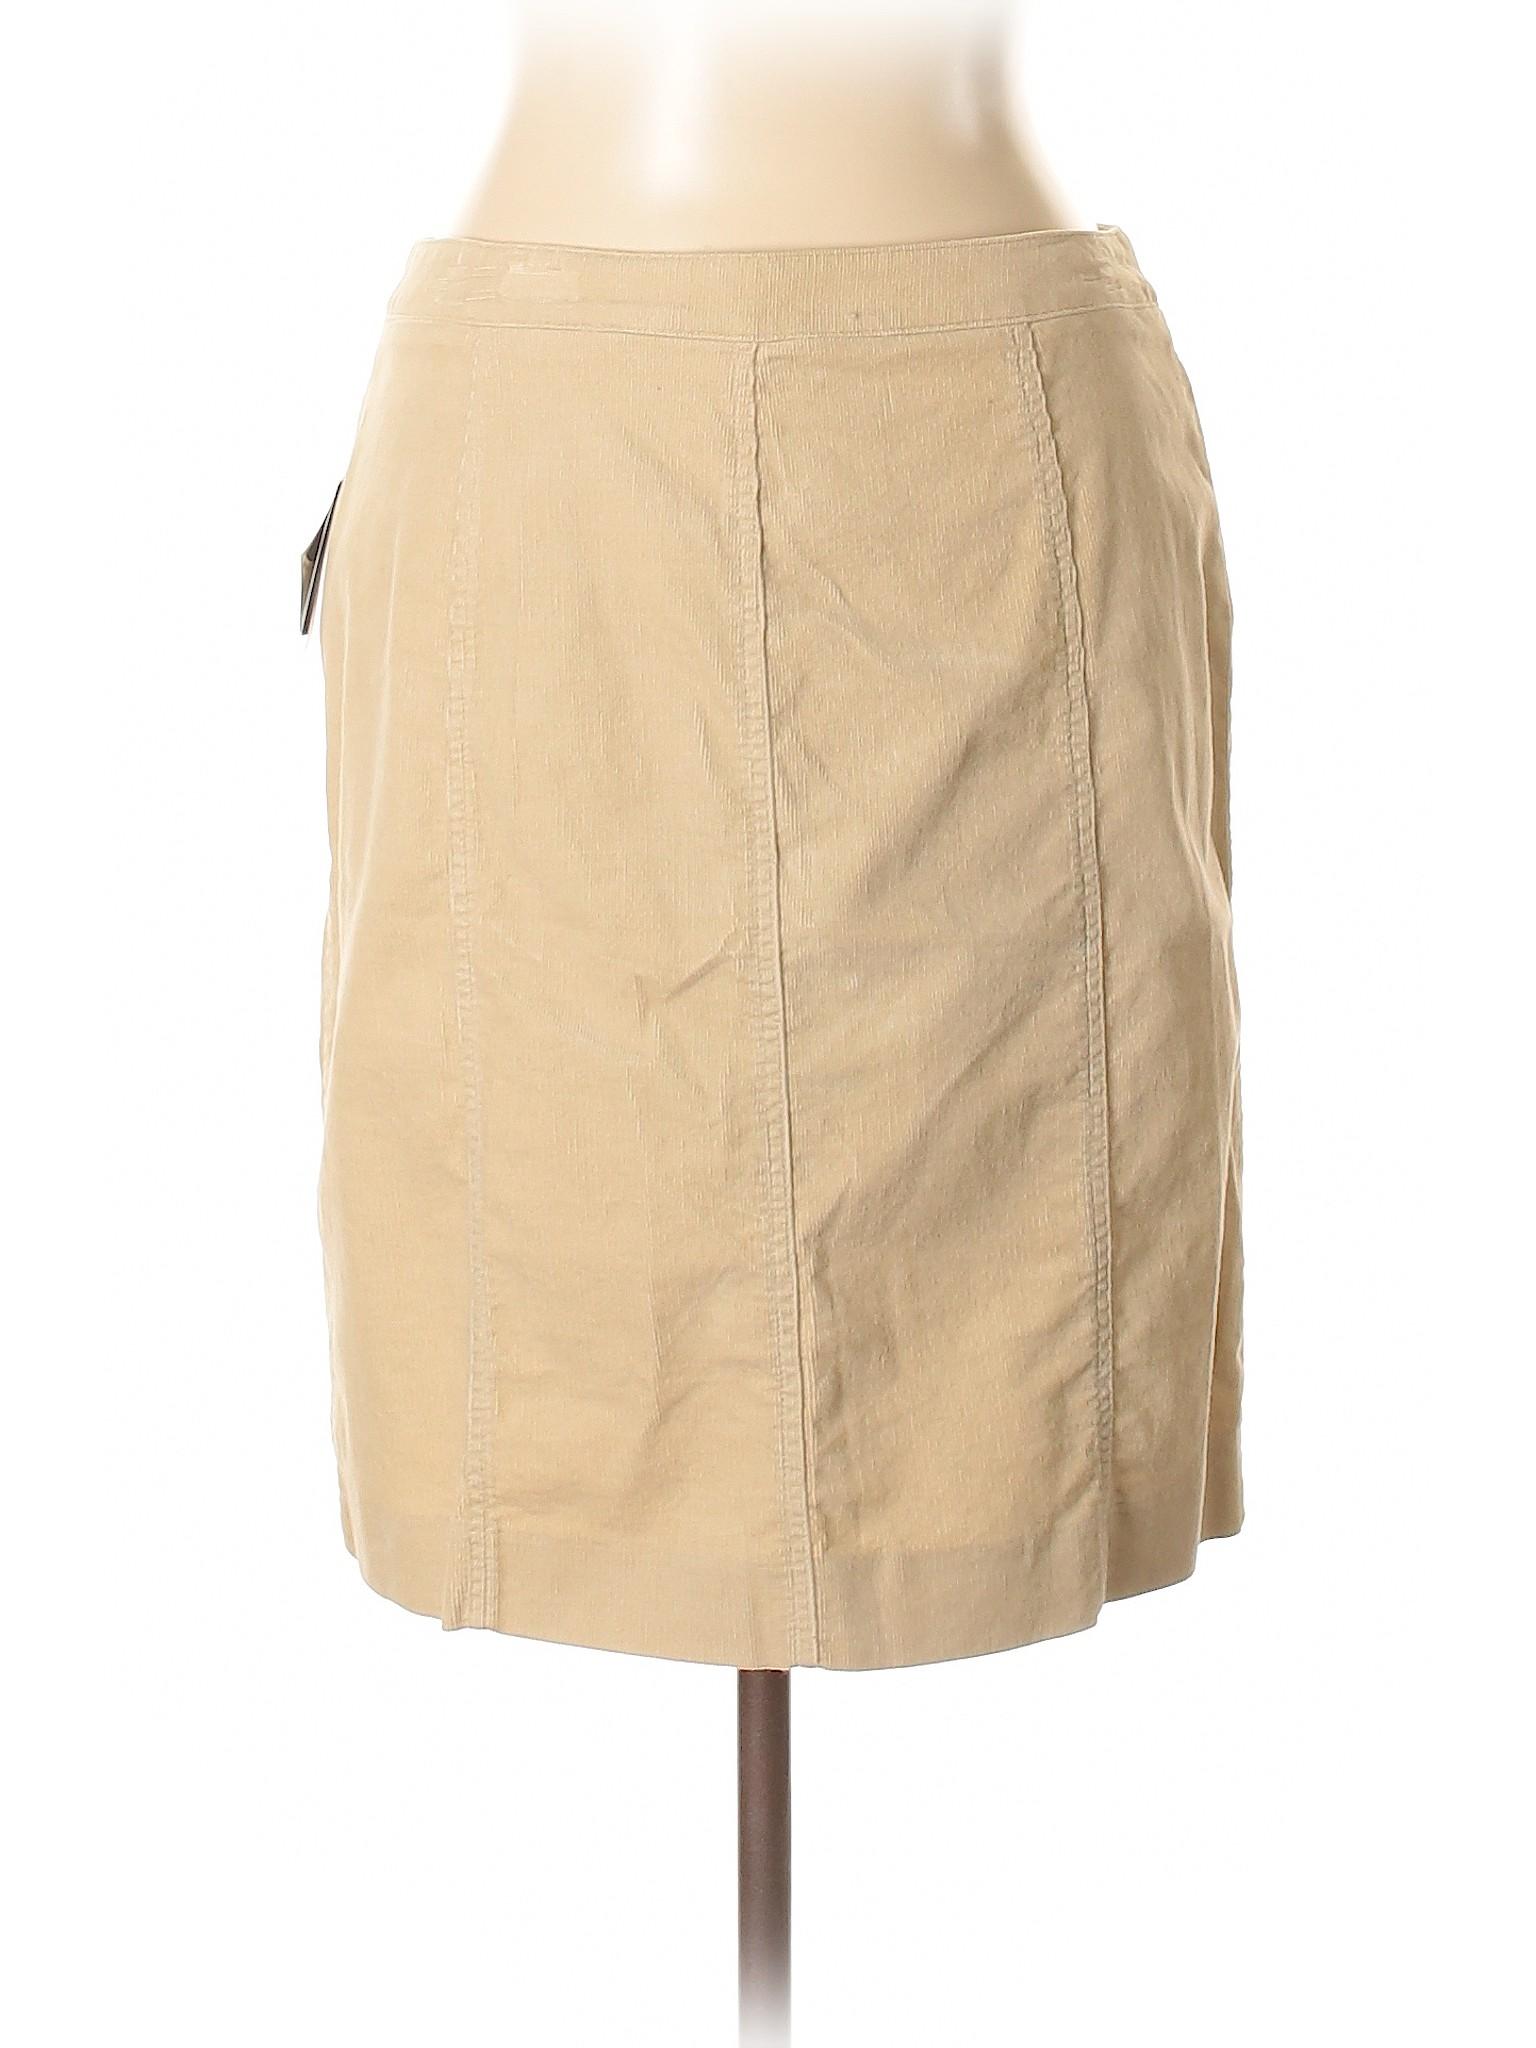 Signature Jones Boutique New leisure Casual Skirt York UIW4Scq